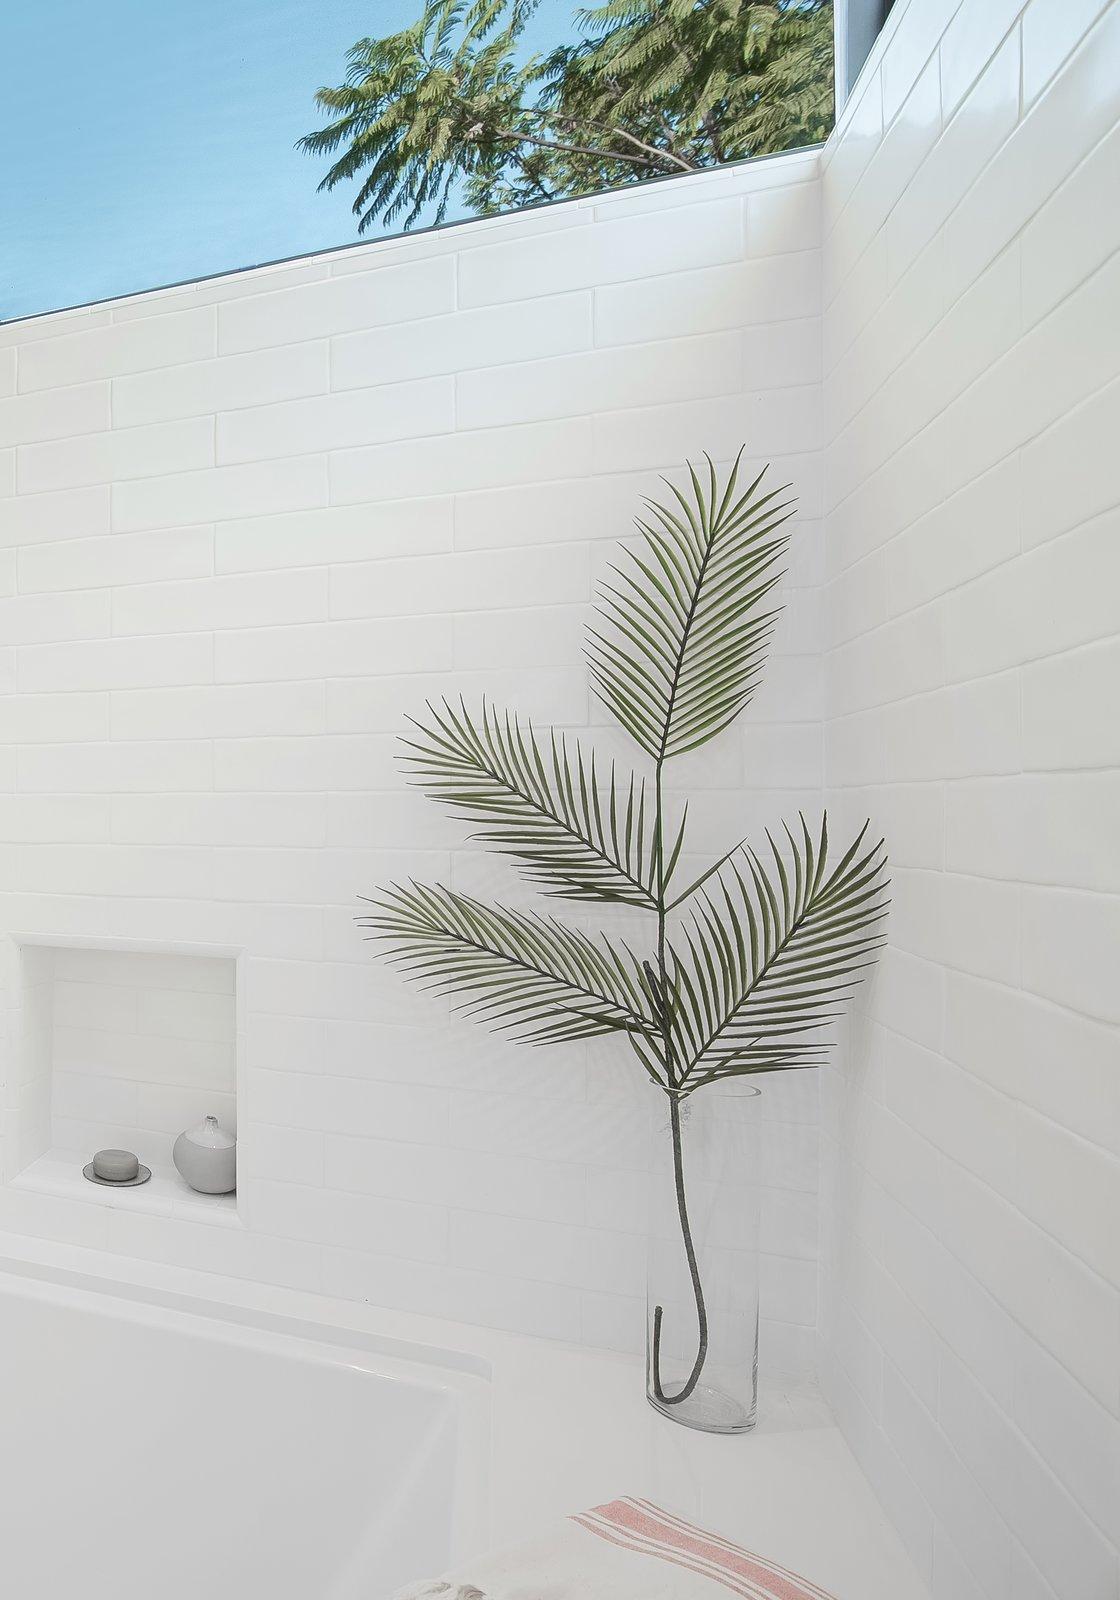 Bath Room, Undermount Tub, Porcelain Tile Floor, Open Shower, and Subway Tile Wall Children's Bathroom  SL House by ANX / Aaron Neubert Architects